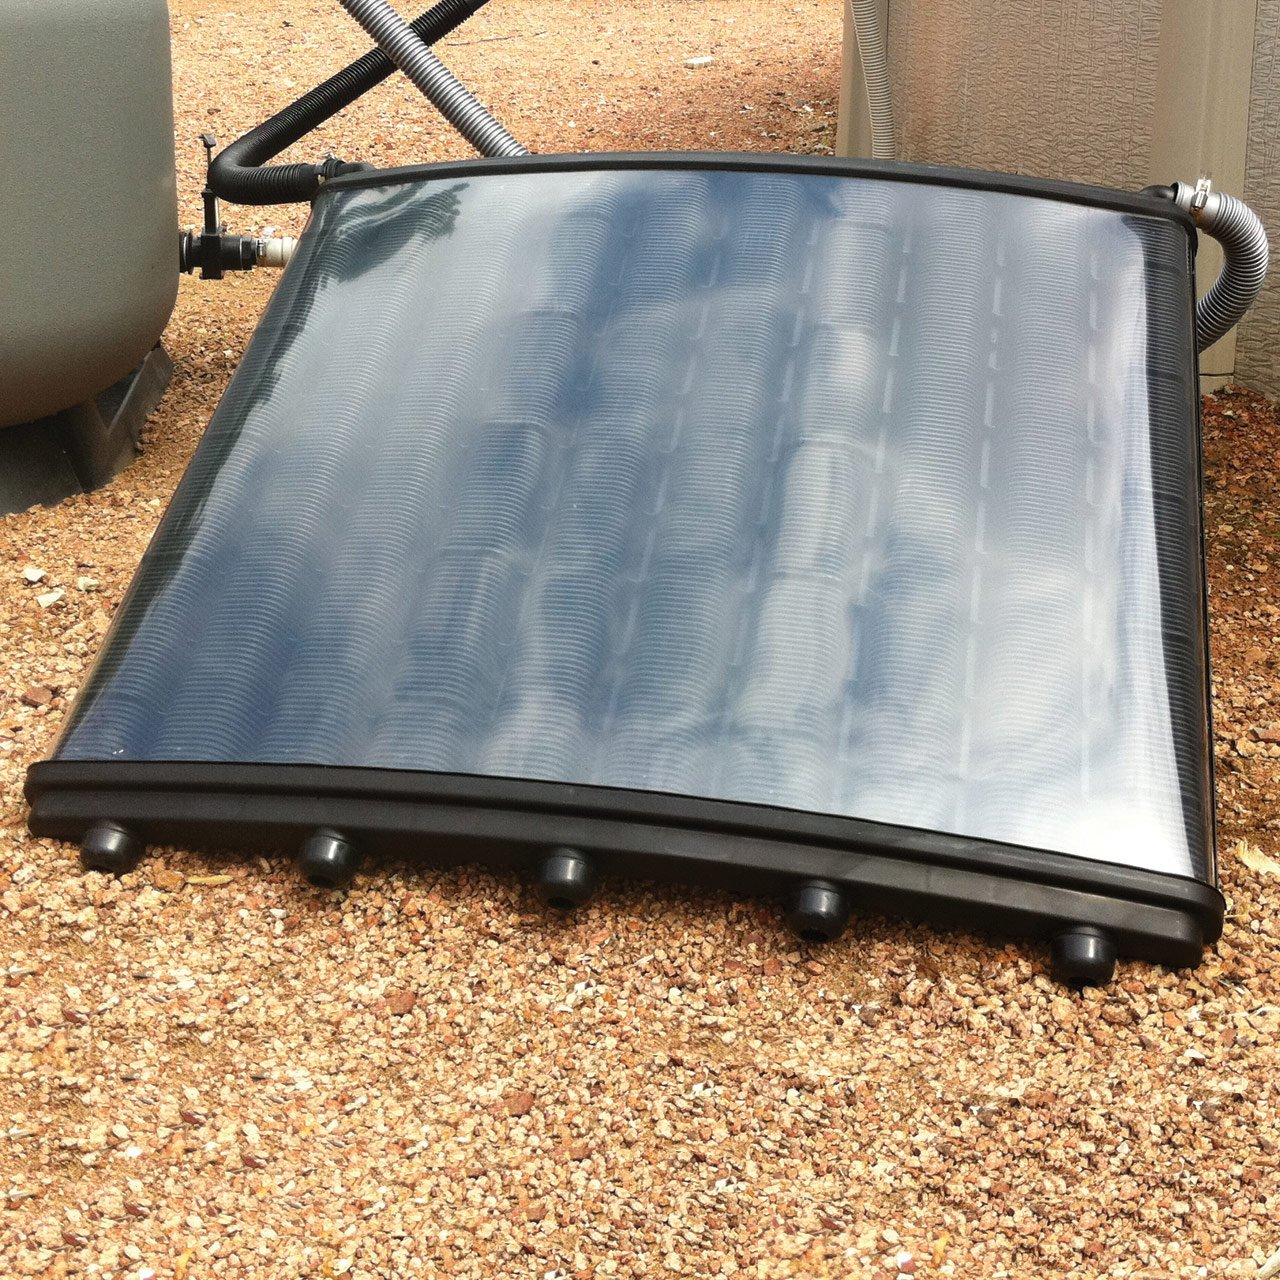 Amazon dohenys solar grid pool heating solar panels amazon dohenys solar grid pool heating solar panels garden outdoor sciox Gallery